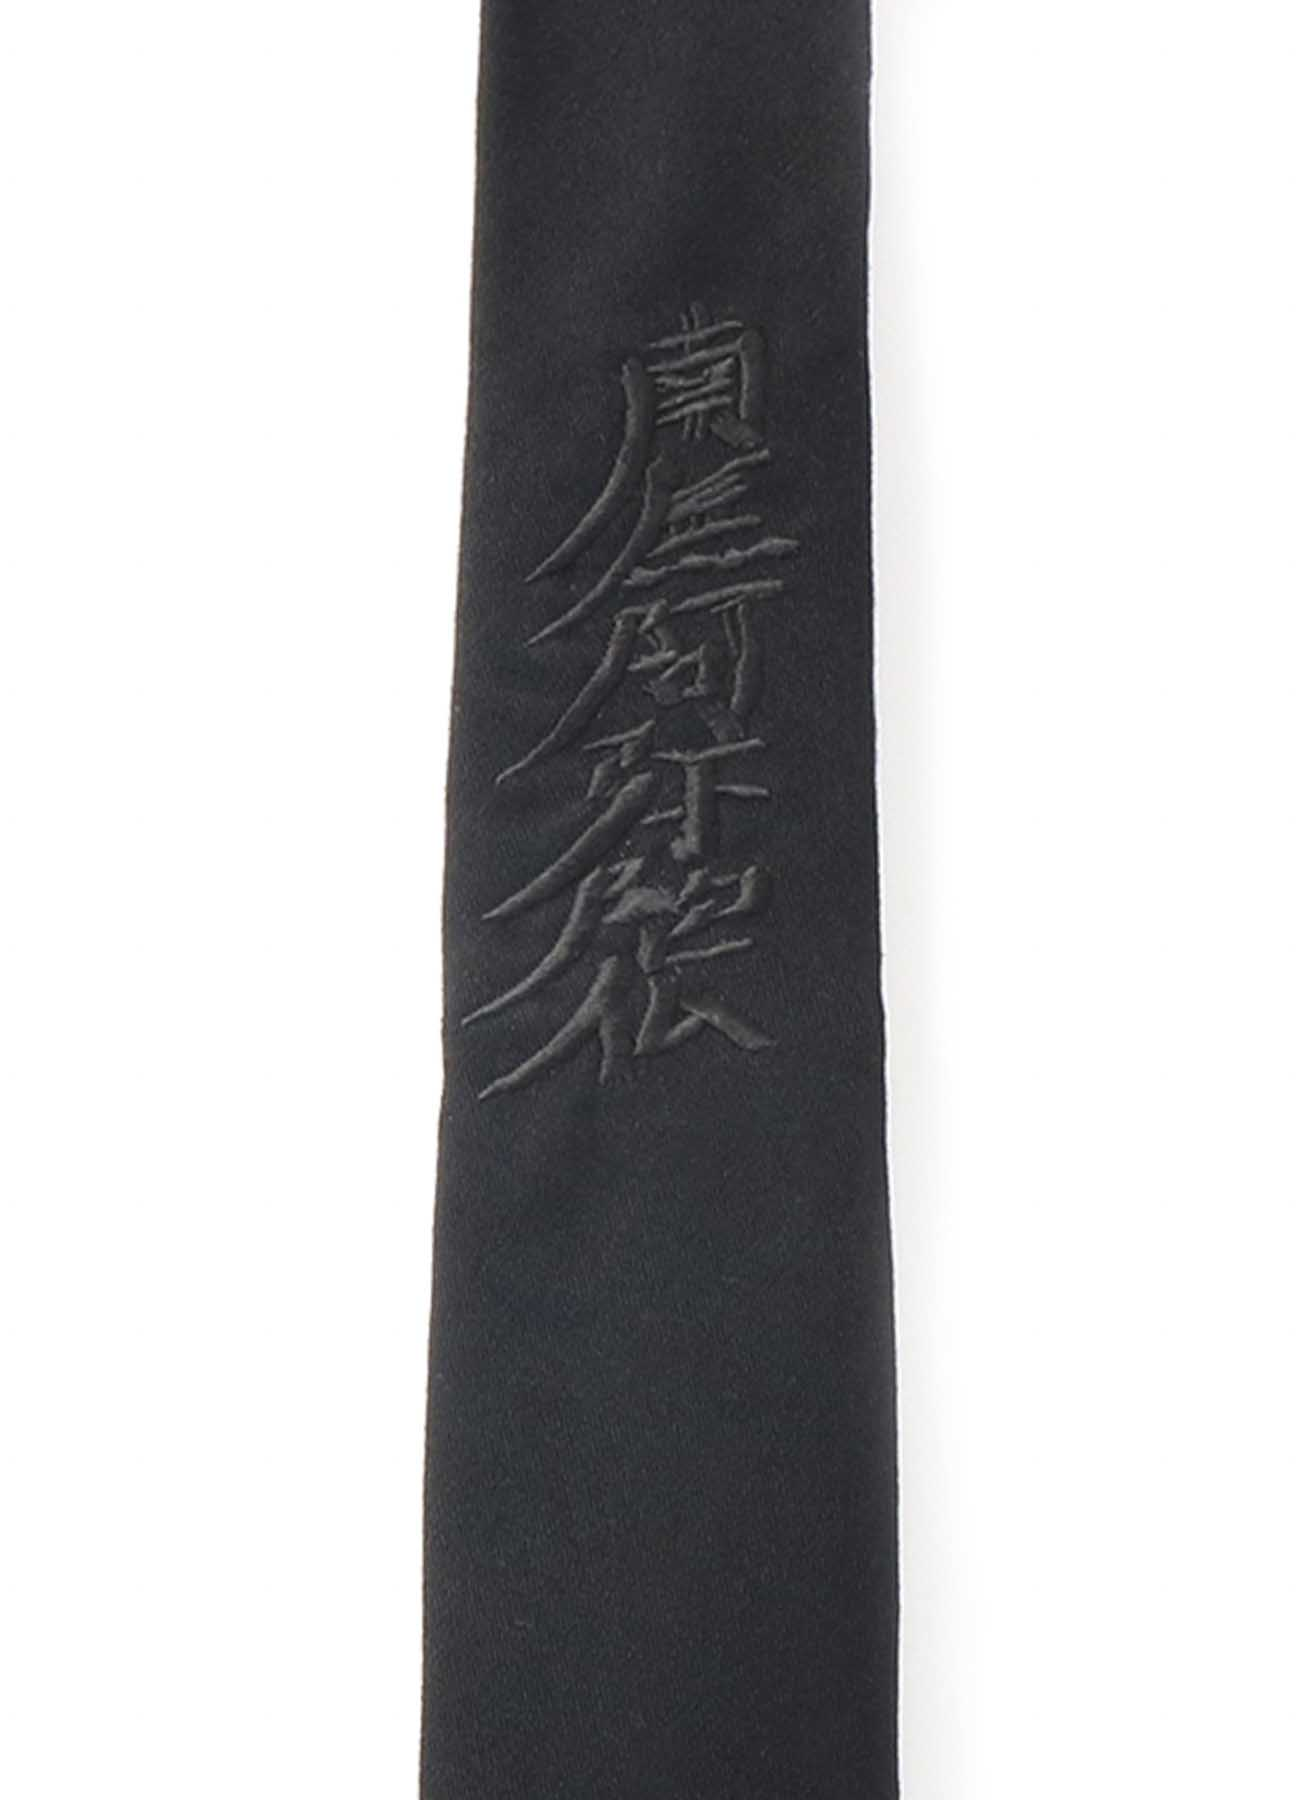 B/南無阿弥陀仏 Embroidery tie